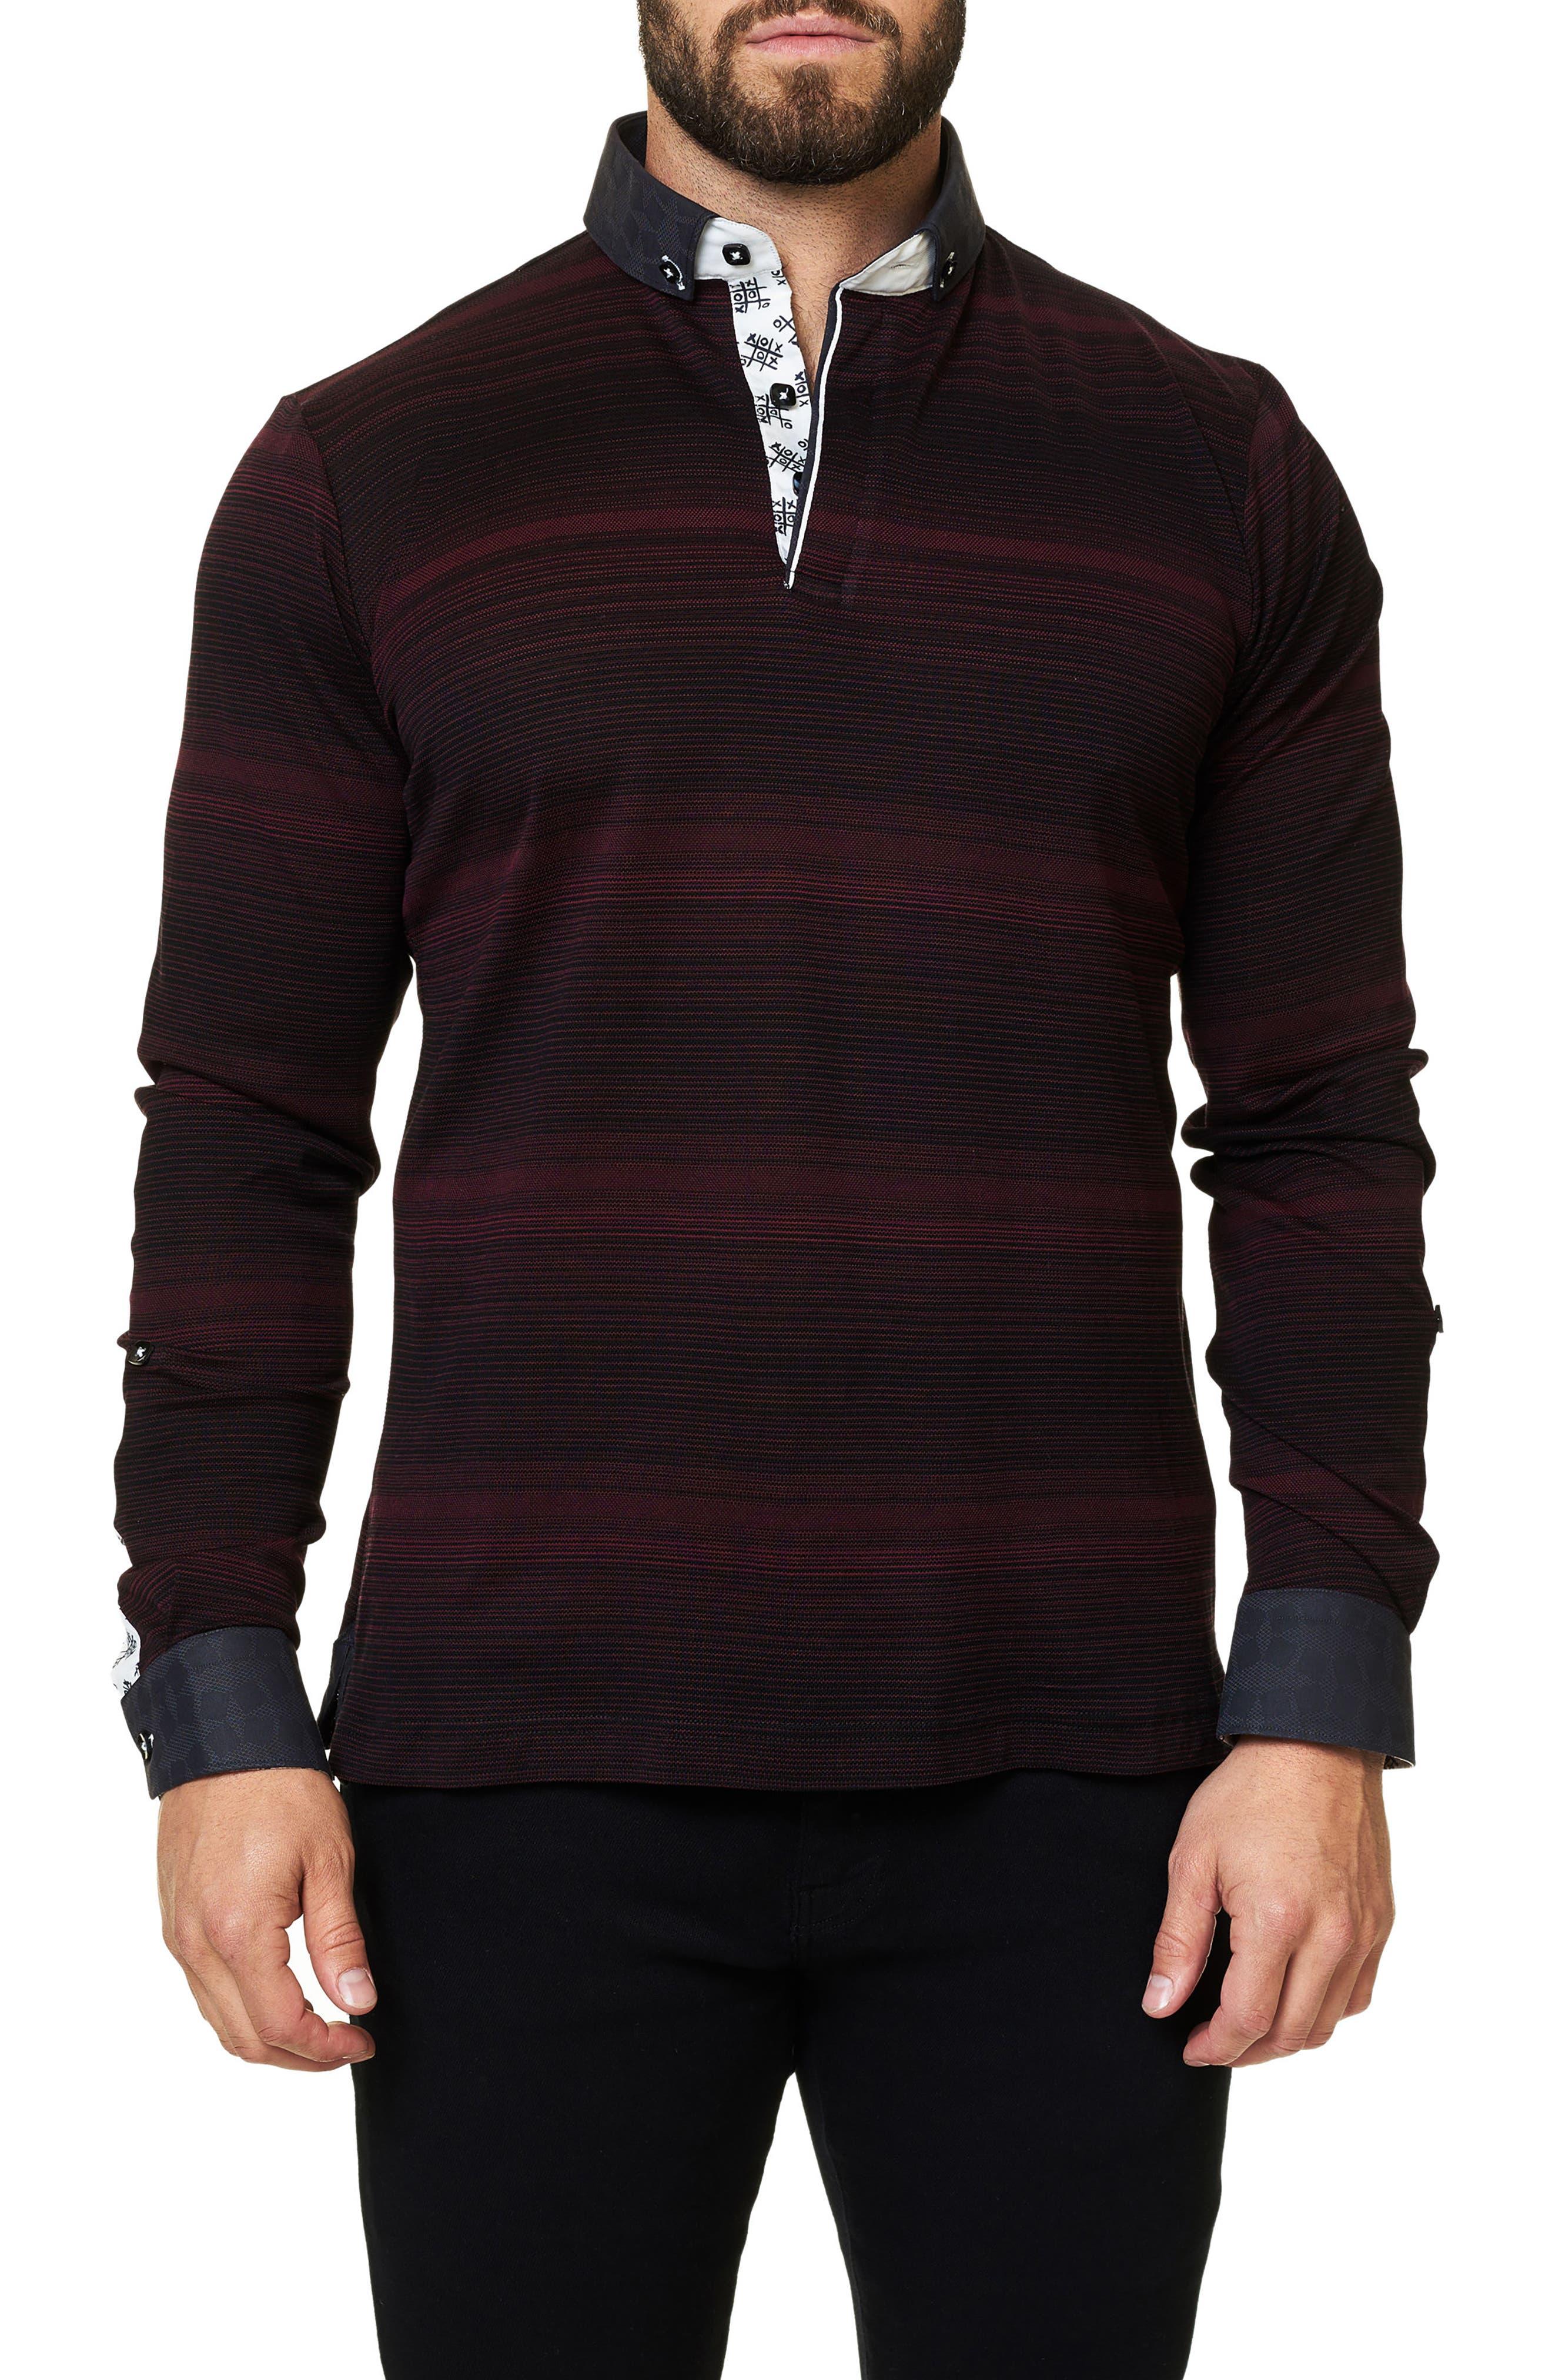 Maceoo Stripe Long Sleeve Polo